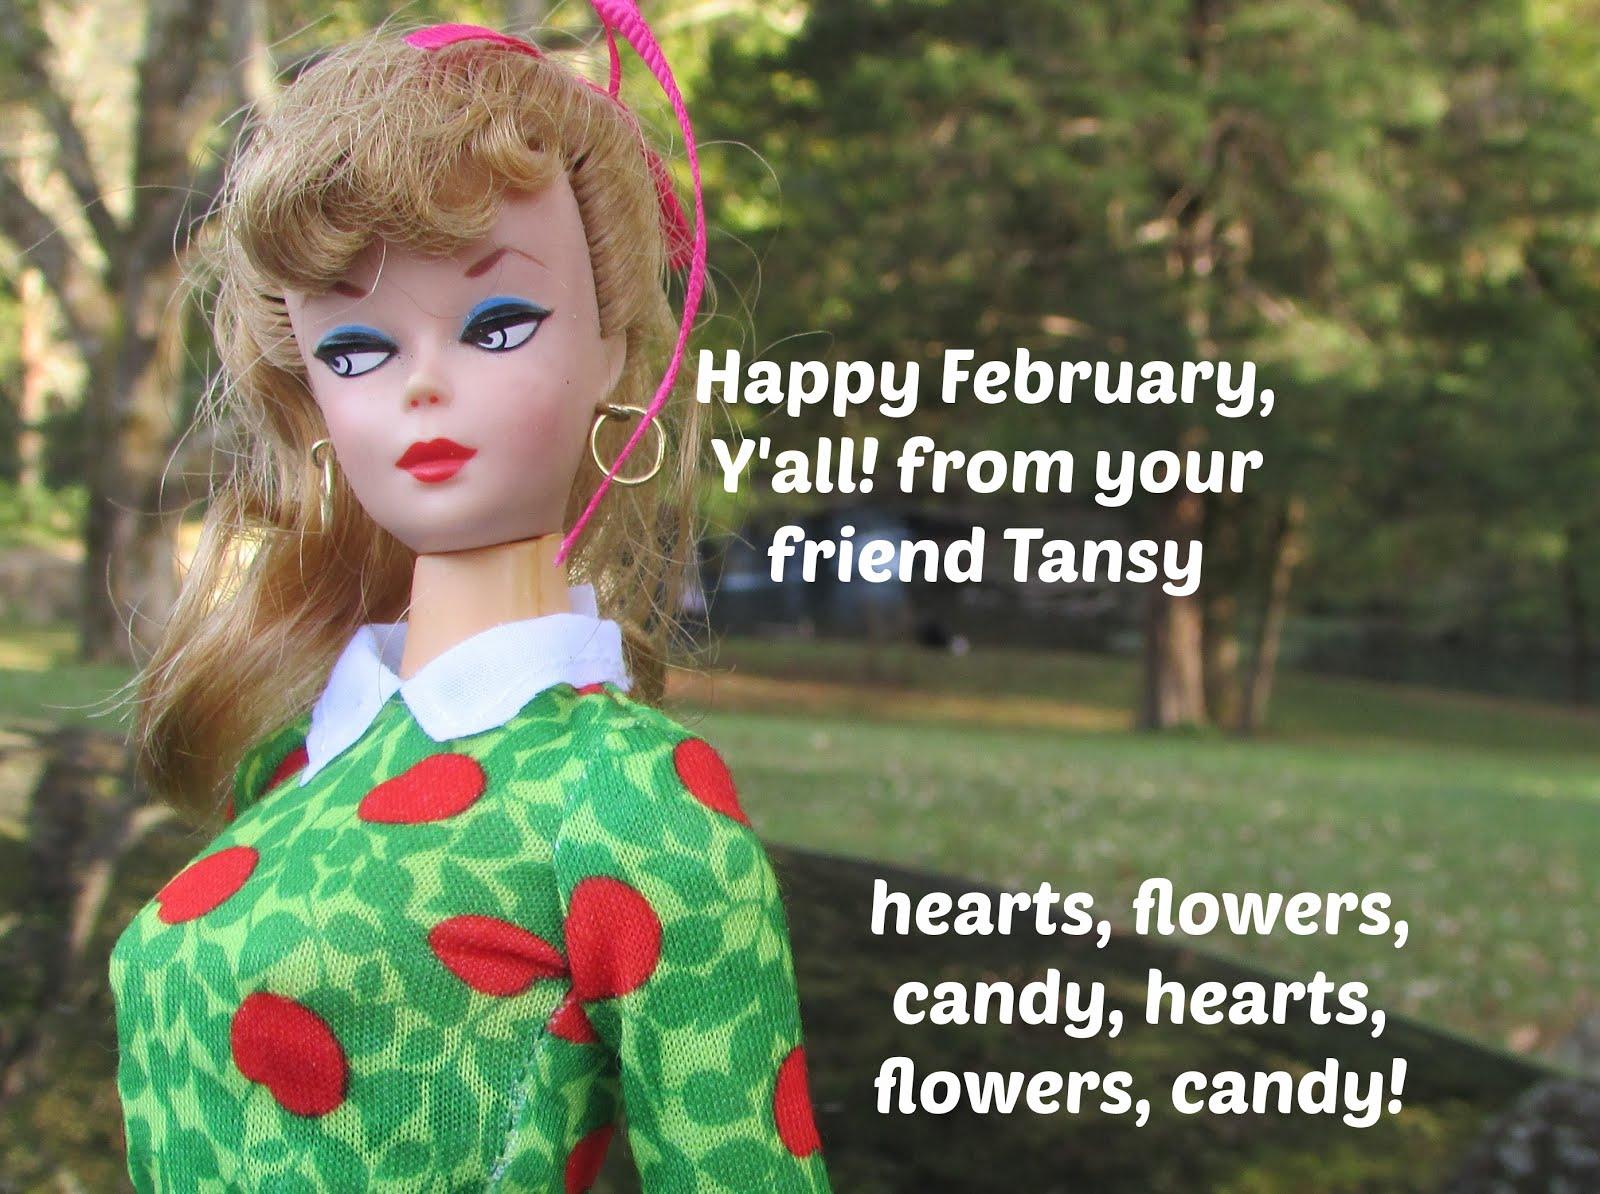 February is here already?! I like JEWELRY!